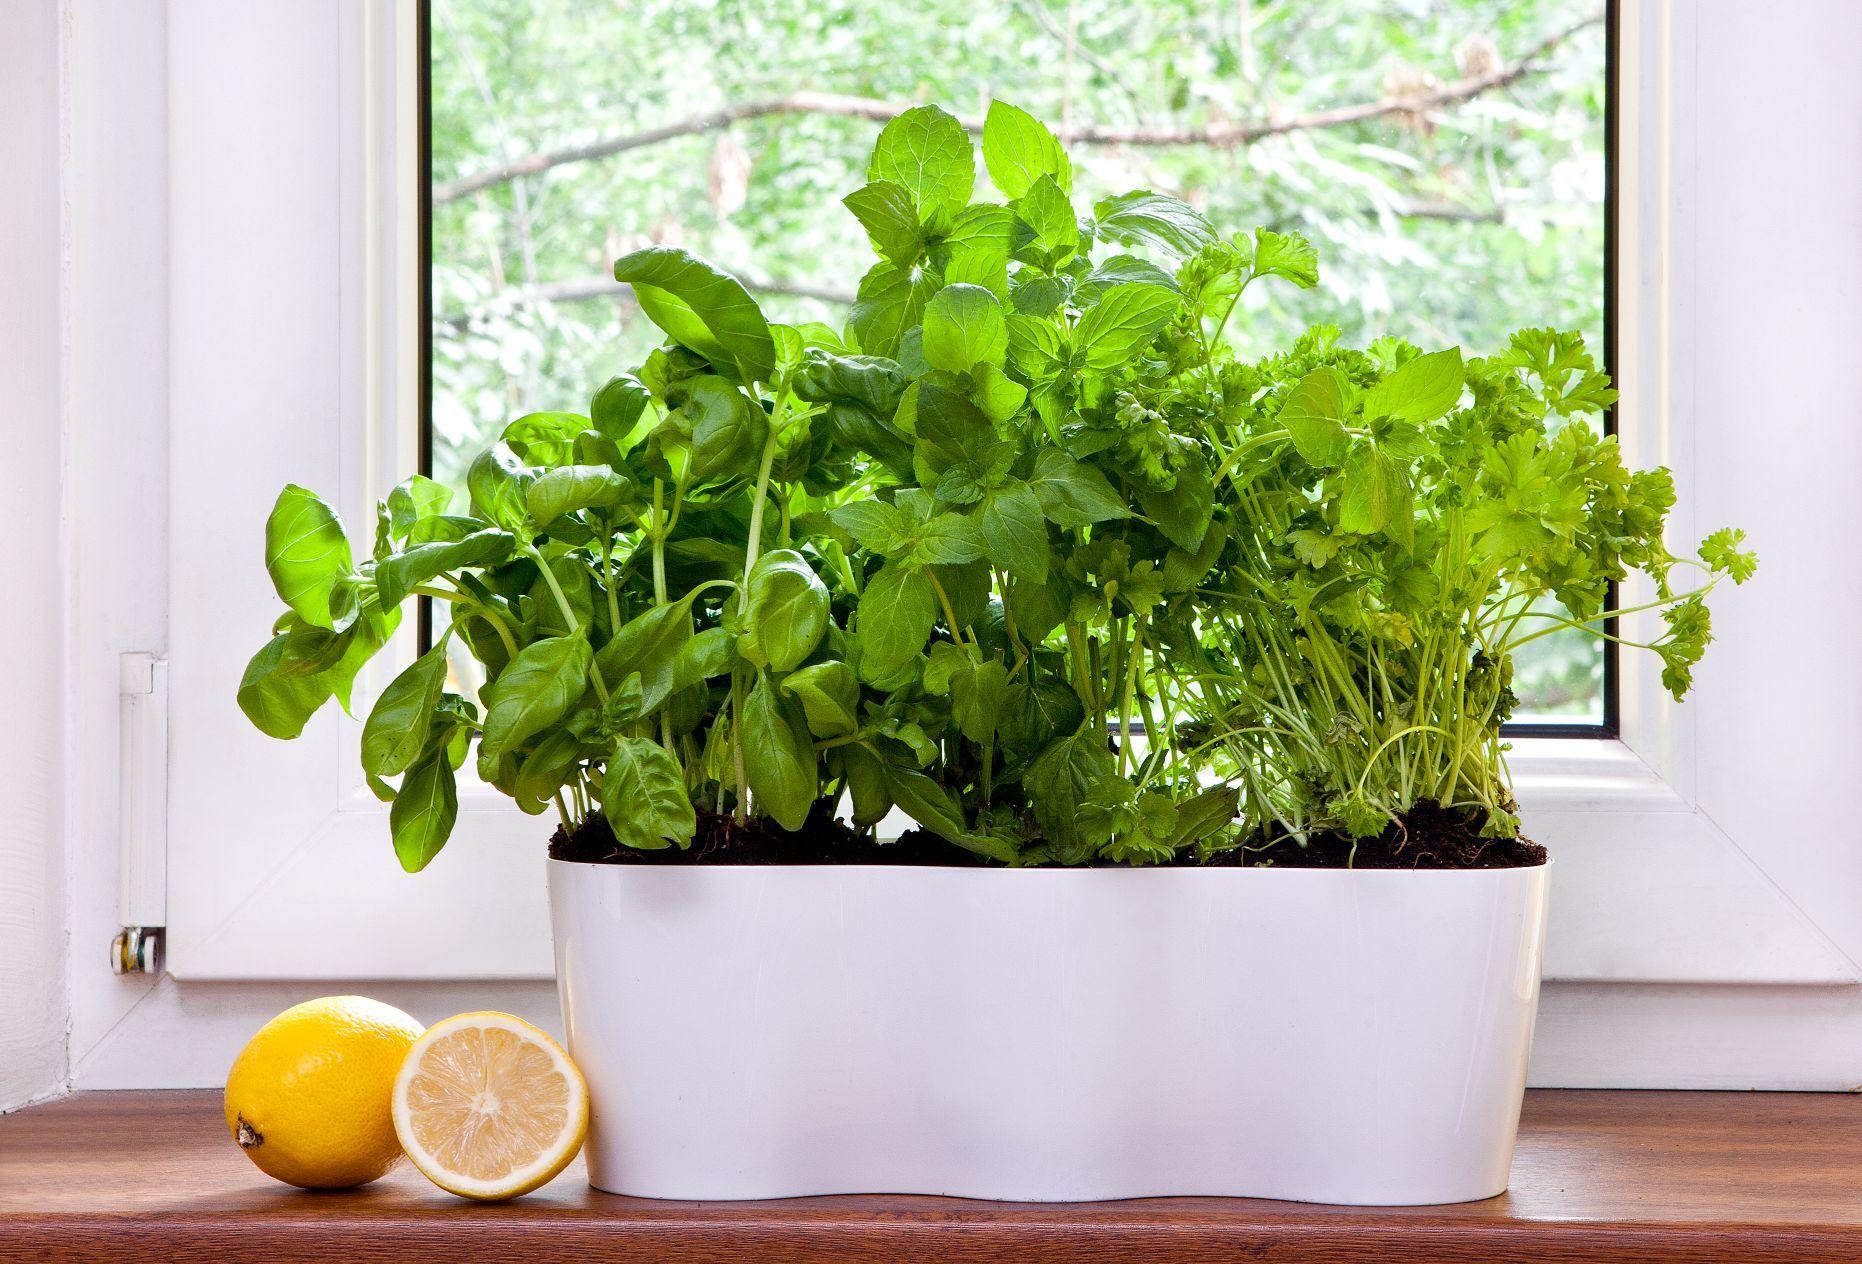 Triple maceta para tus plantas arom ticas en la cocina - Plantas aromaticas en la cocina ...